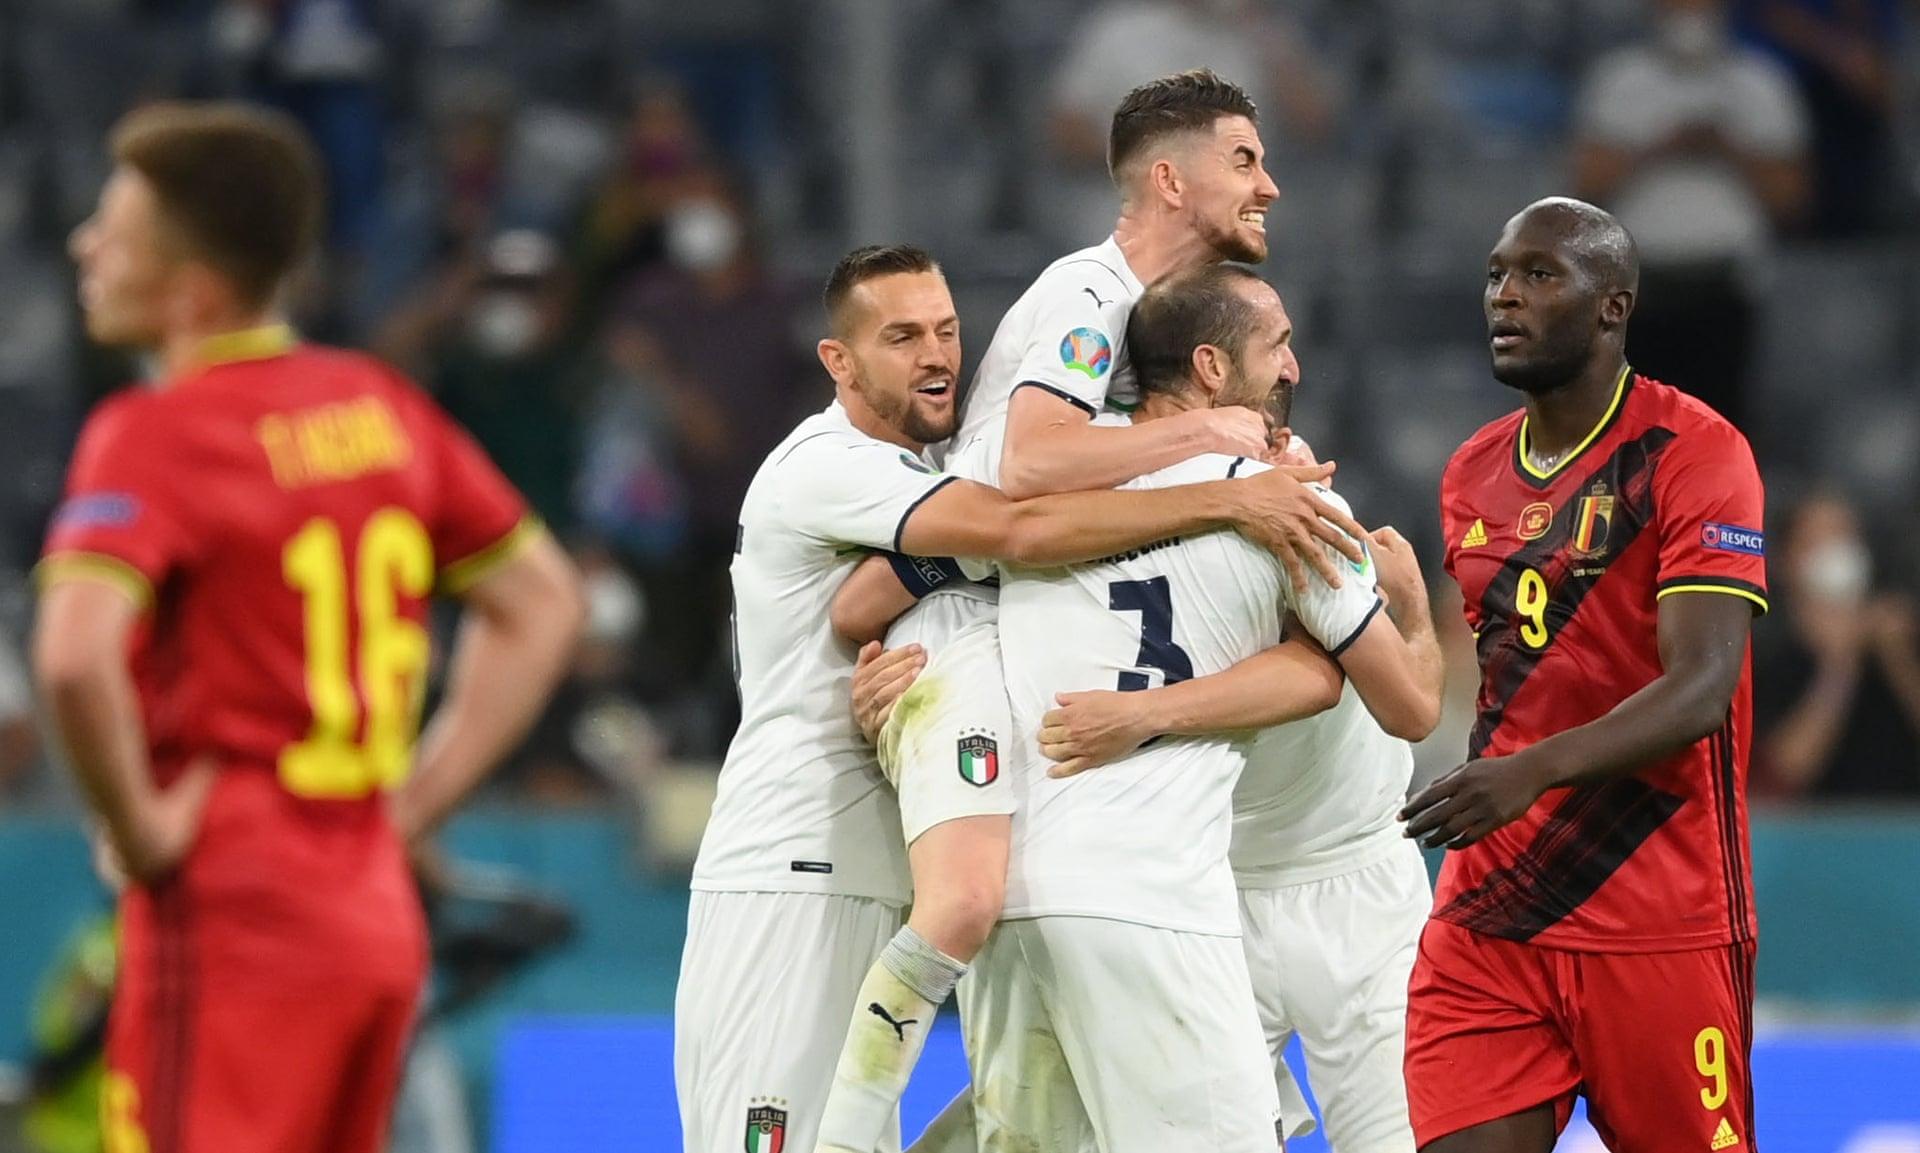 Chiellini dan rekan setimnya di Italia saling berpelukan untuk merayakan kemenangan atas kekecewaan Lukaku dan Thorgan Hazard usai perempat final Euro 2021 di Allianz Stadium, Munich, Jerman pada 2 Juli.  Foto: Reuters